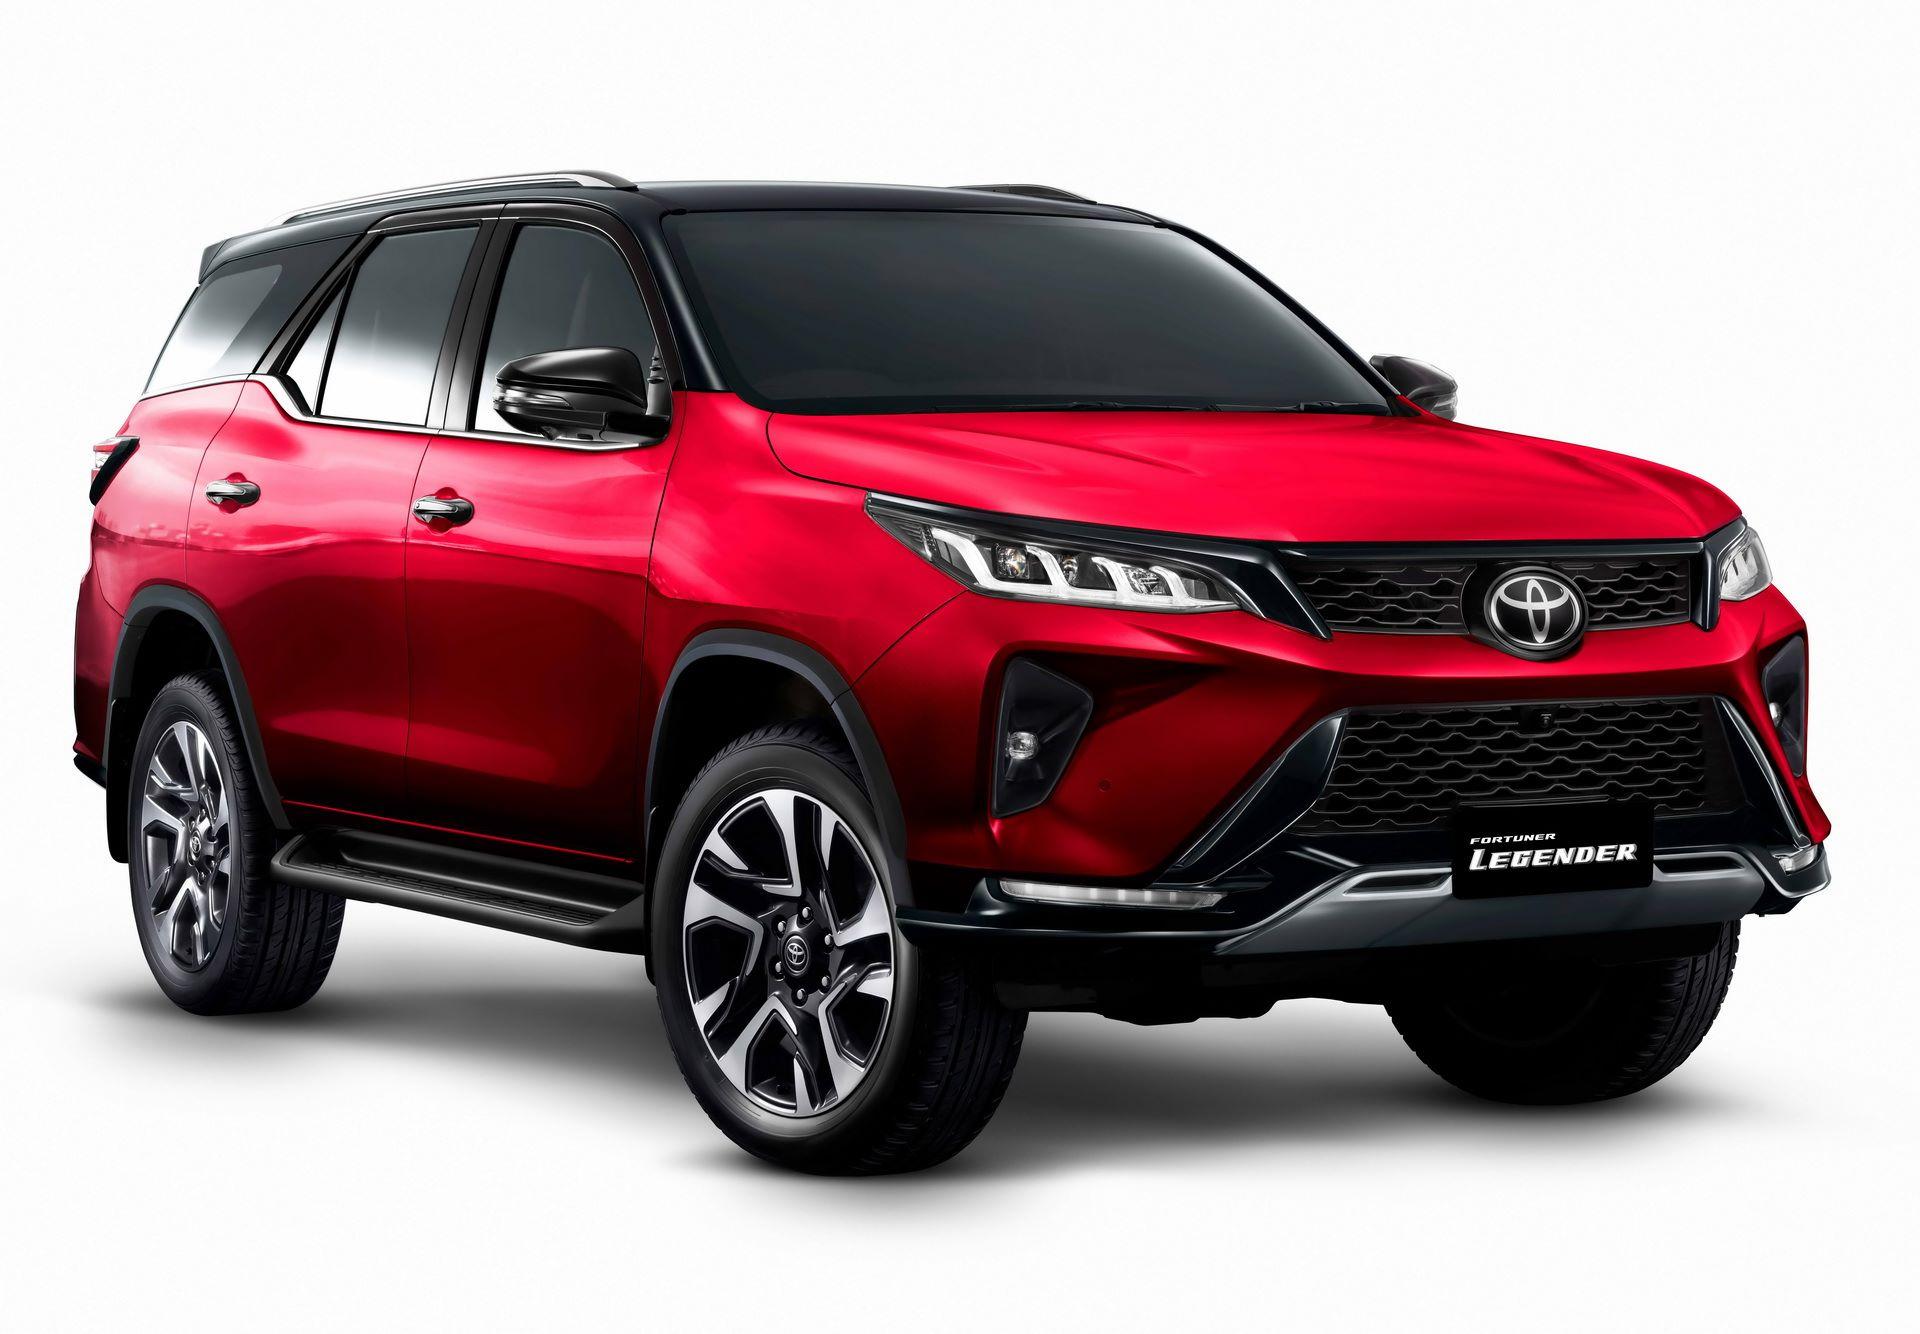 Toyota-Fortuner-2020-16